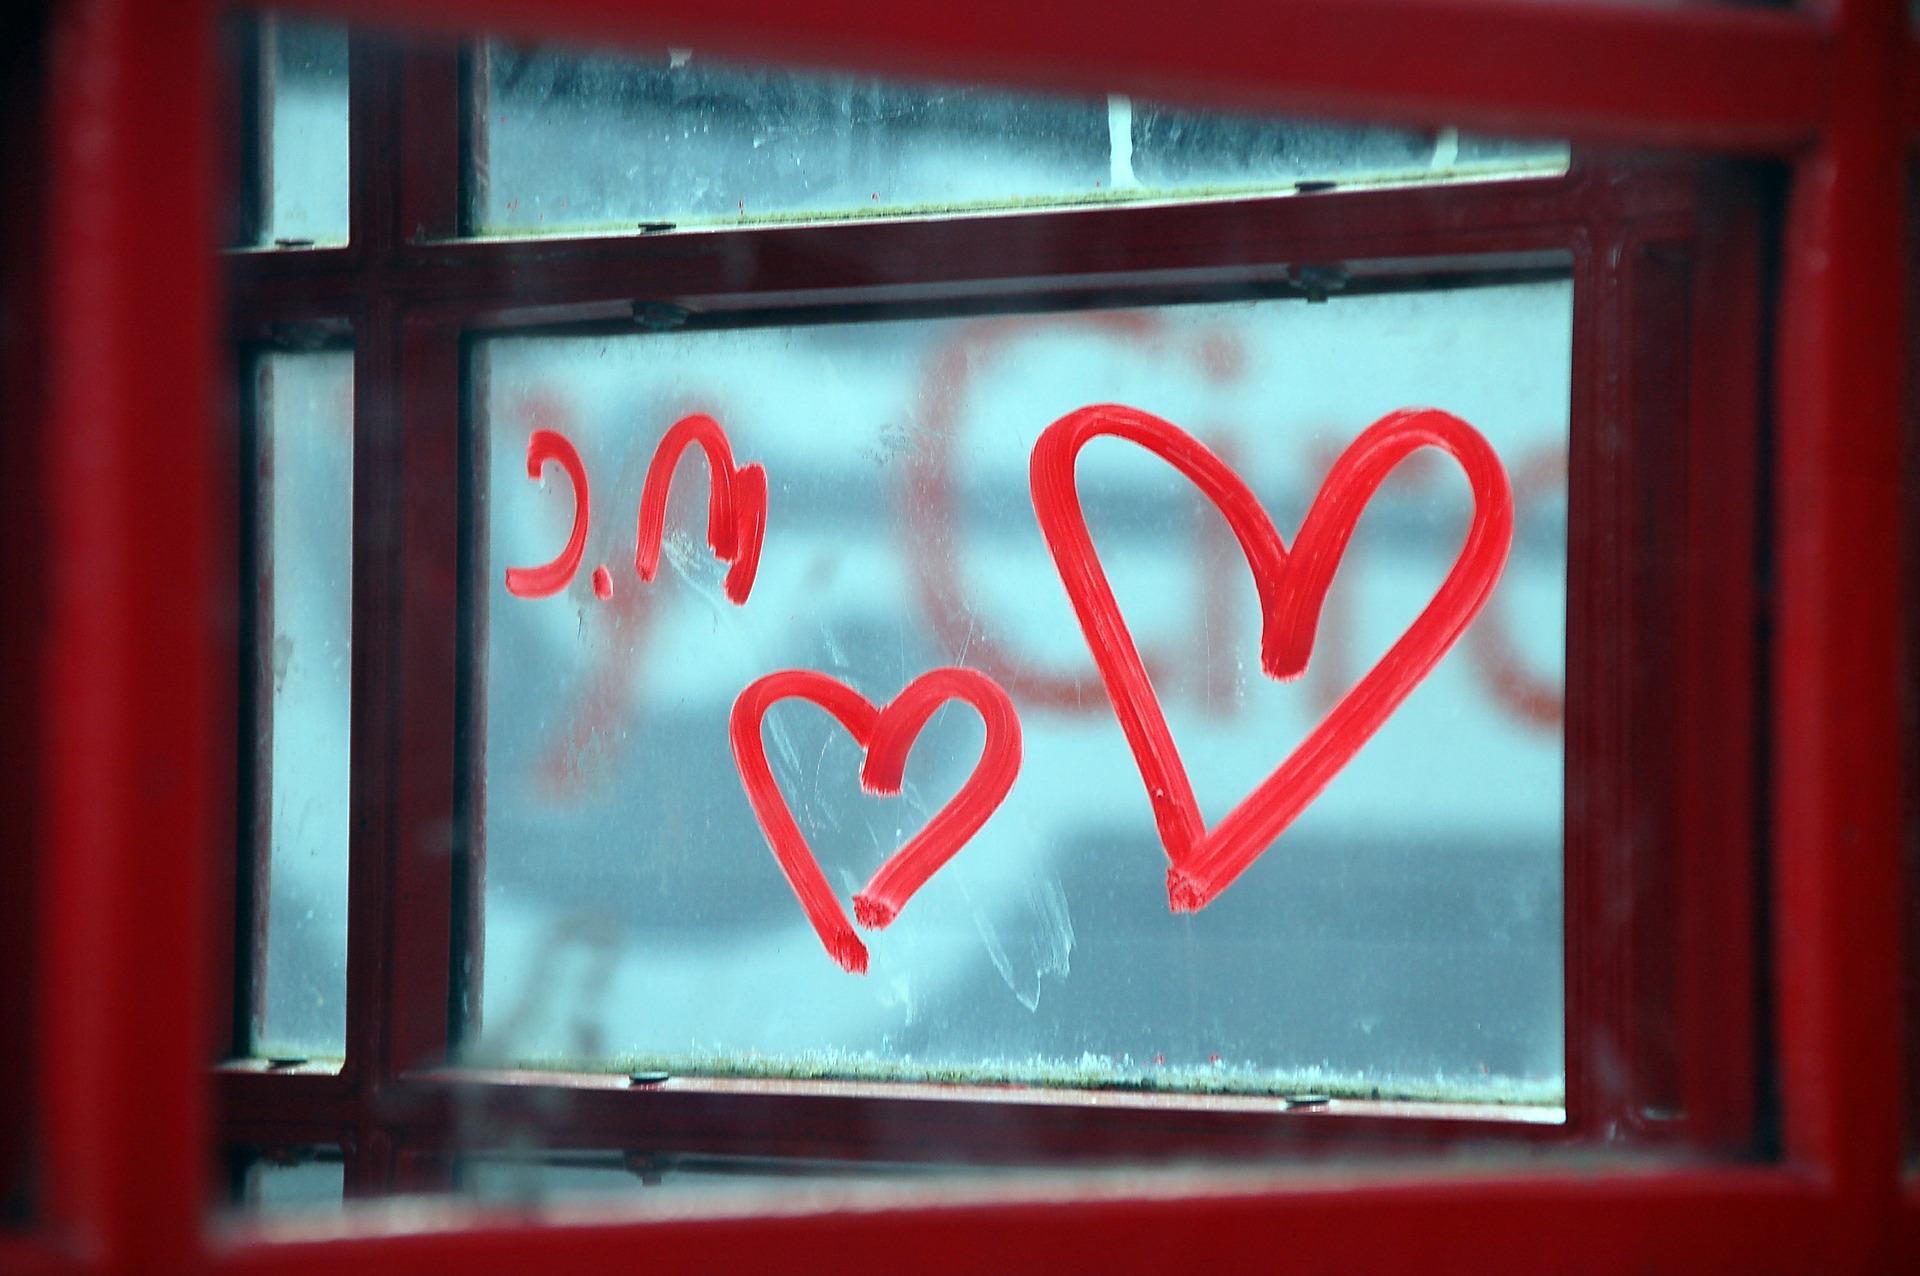 Lipstick hearts on a phone box